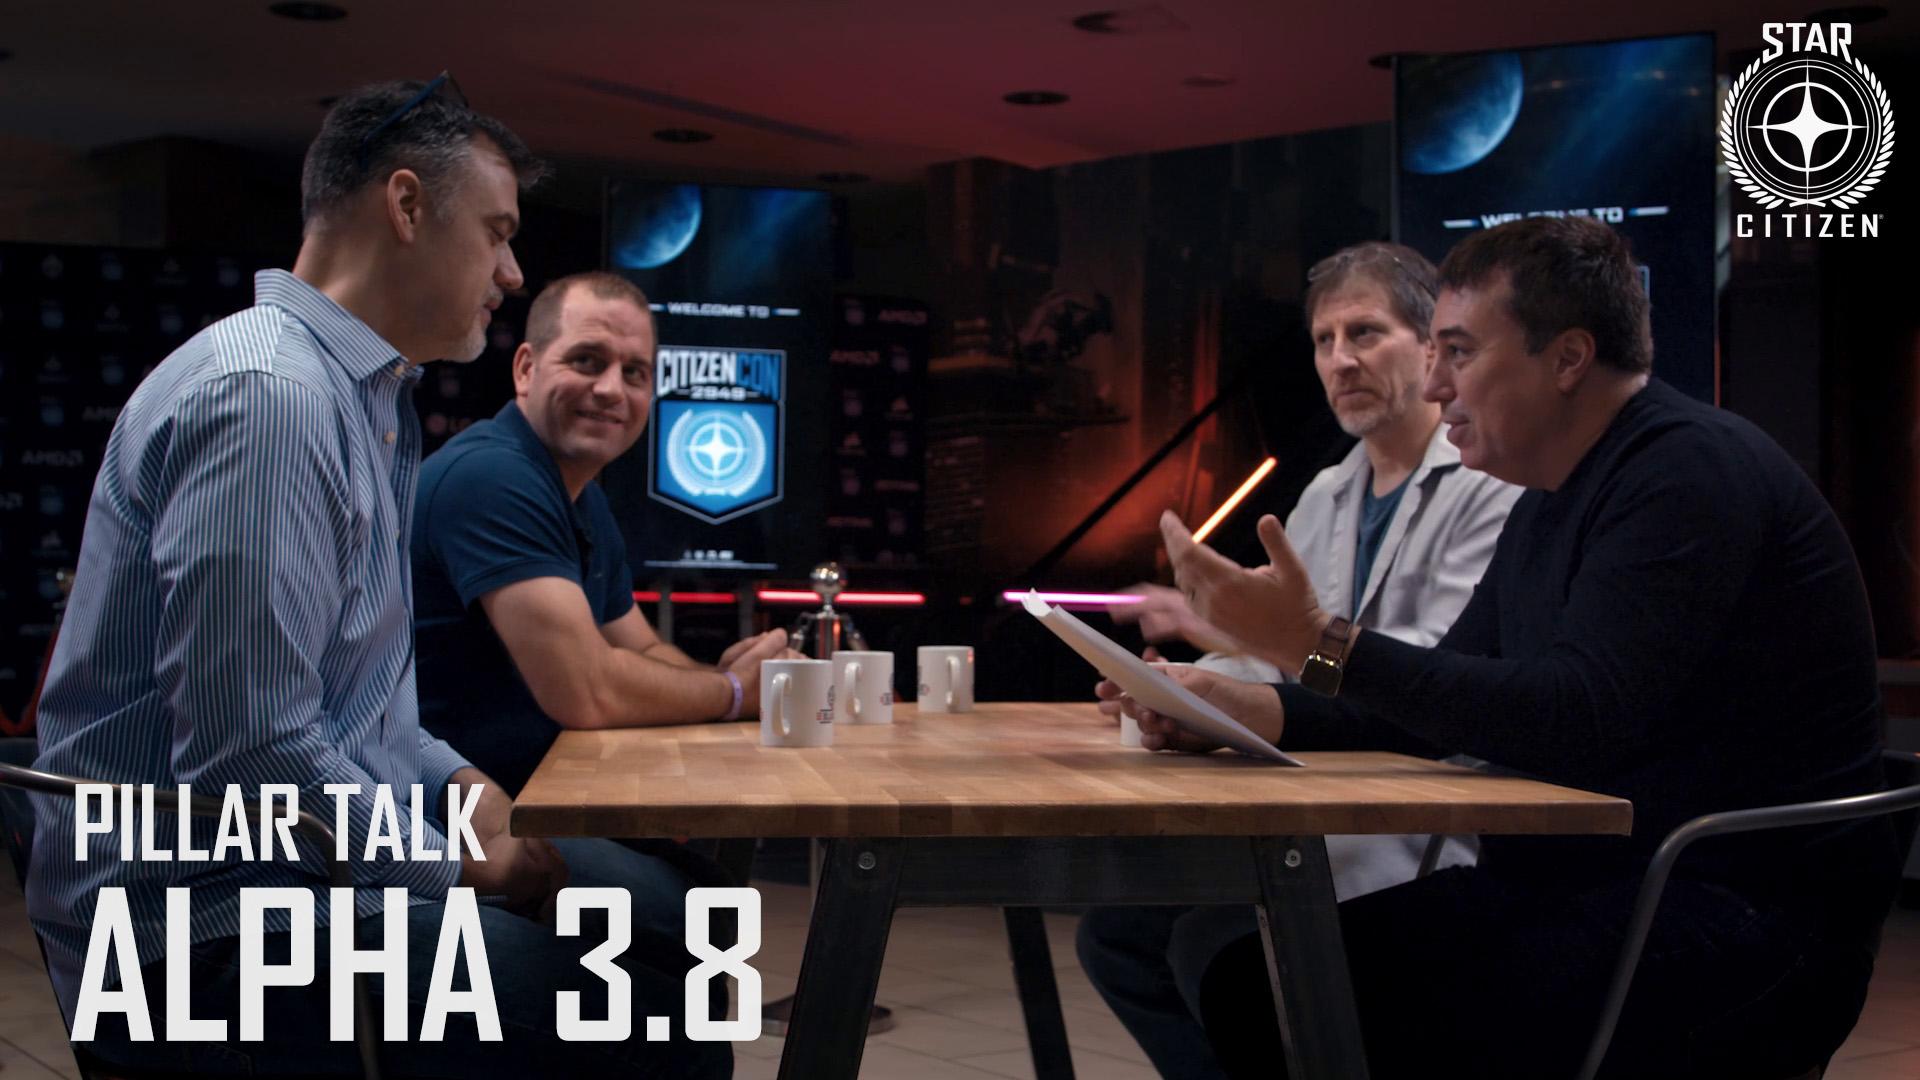 Pillar Talk 3.8